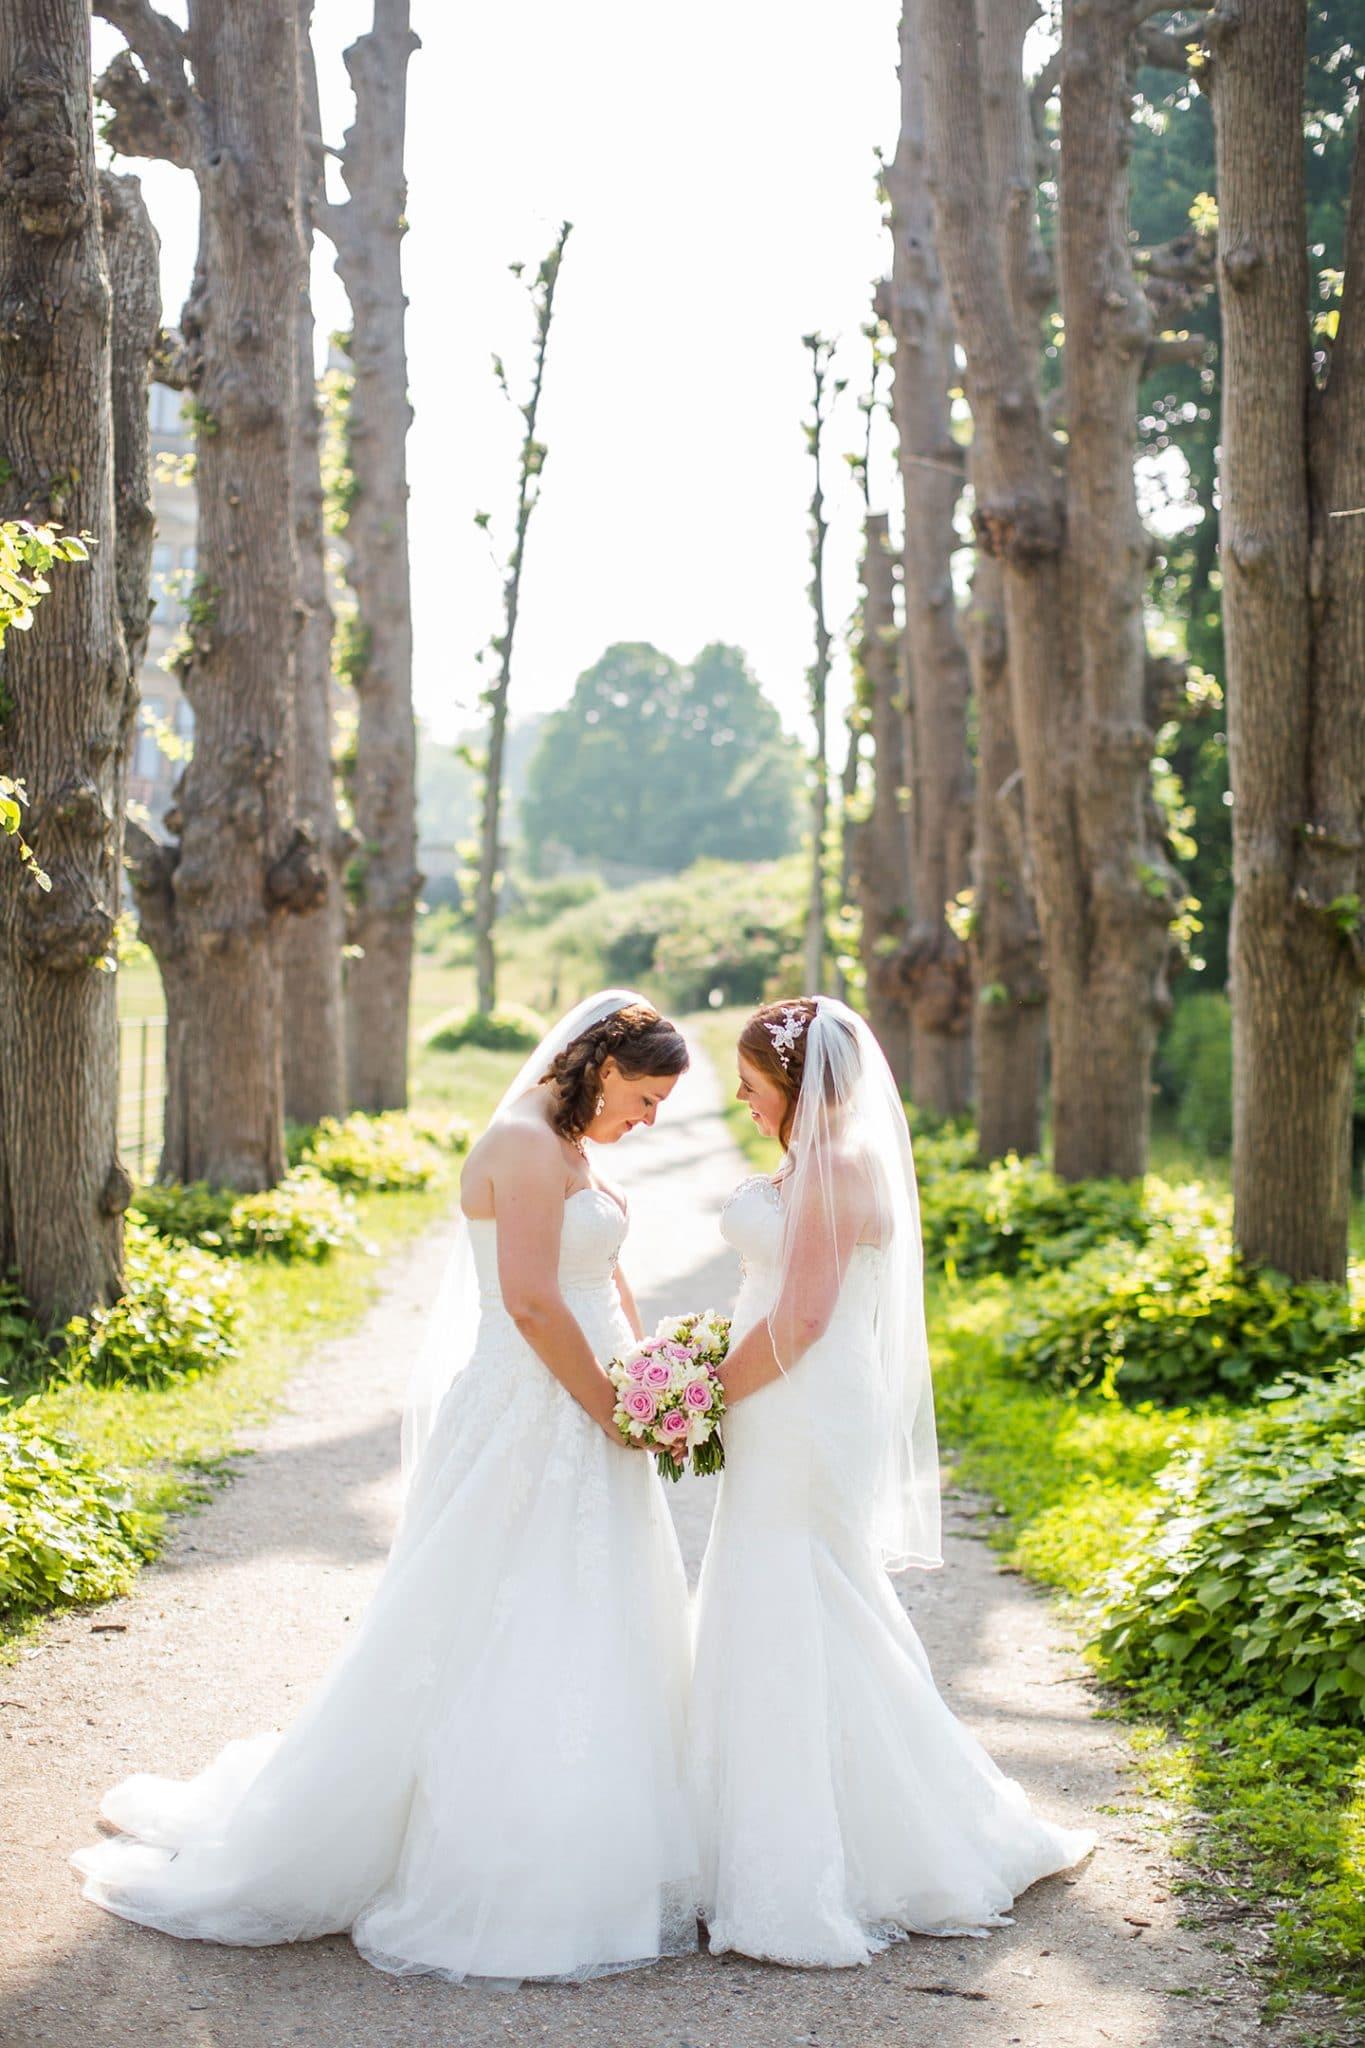 Bruidsfotografie lesbische bruiloft